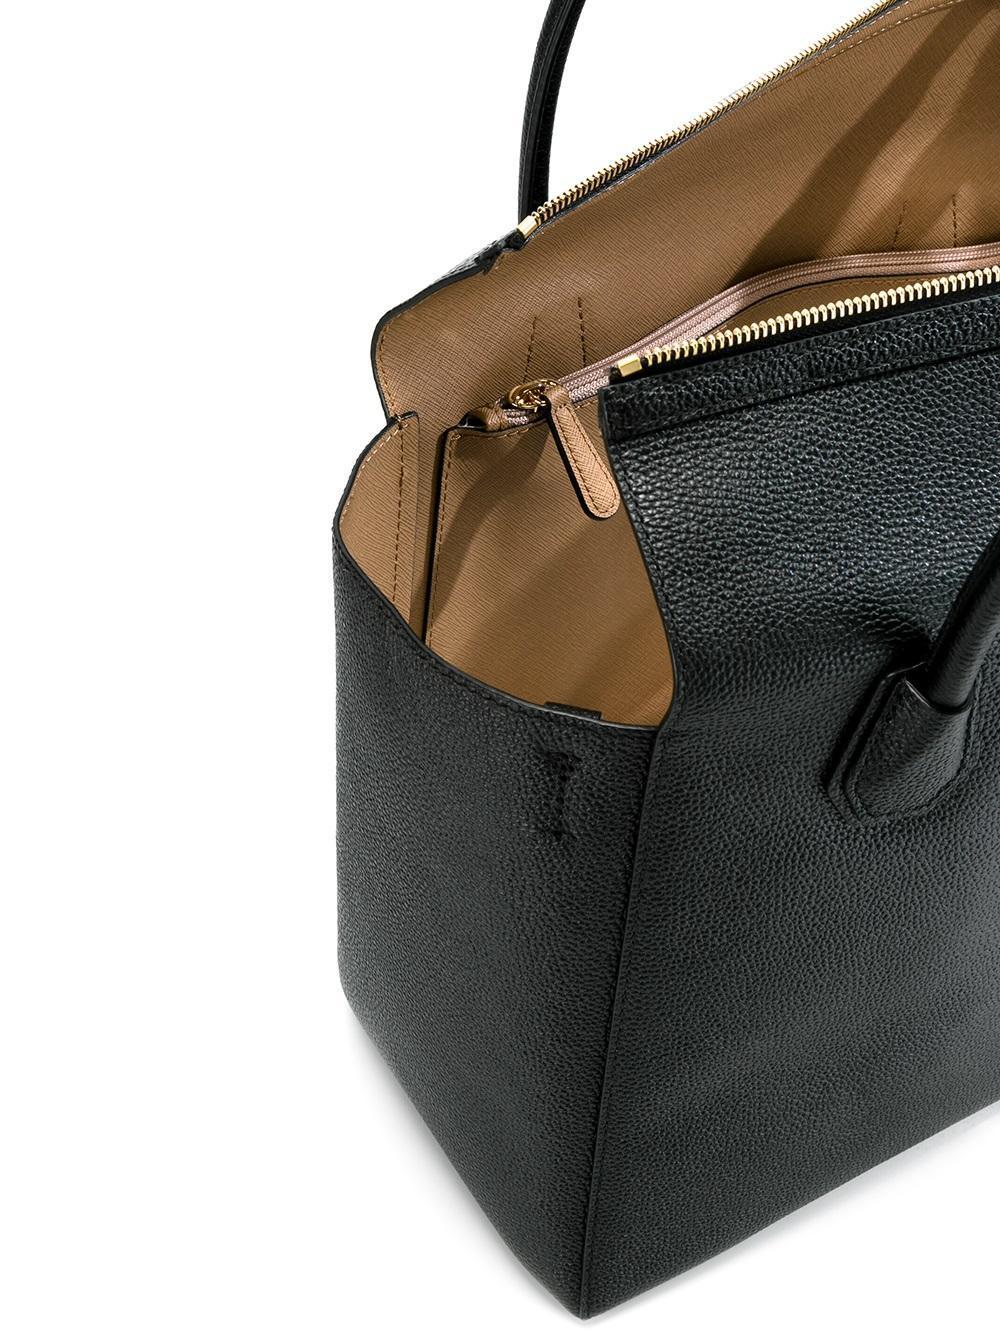 MICHAEL Michael Kors Leather 'mercer' Tote in Black